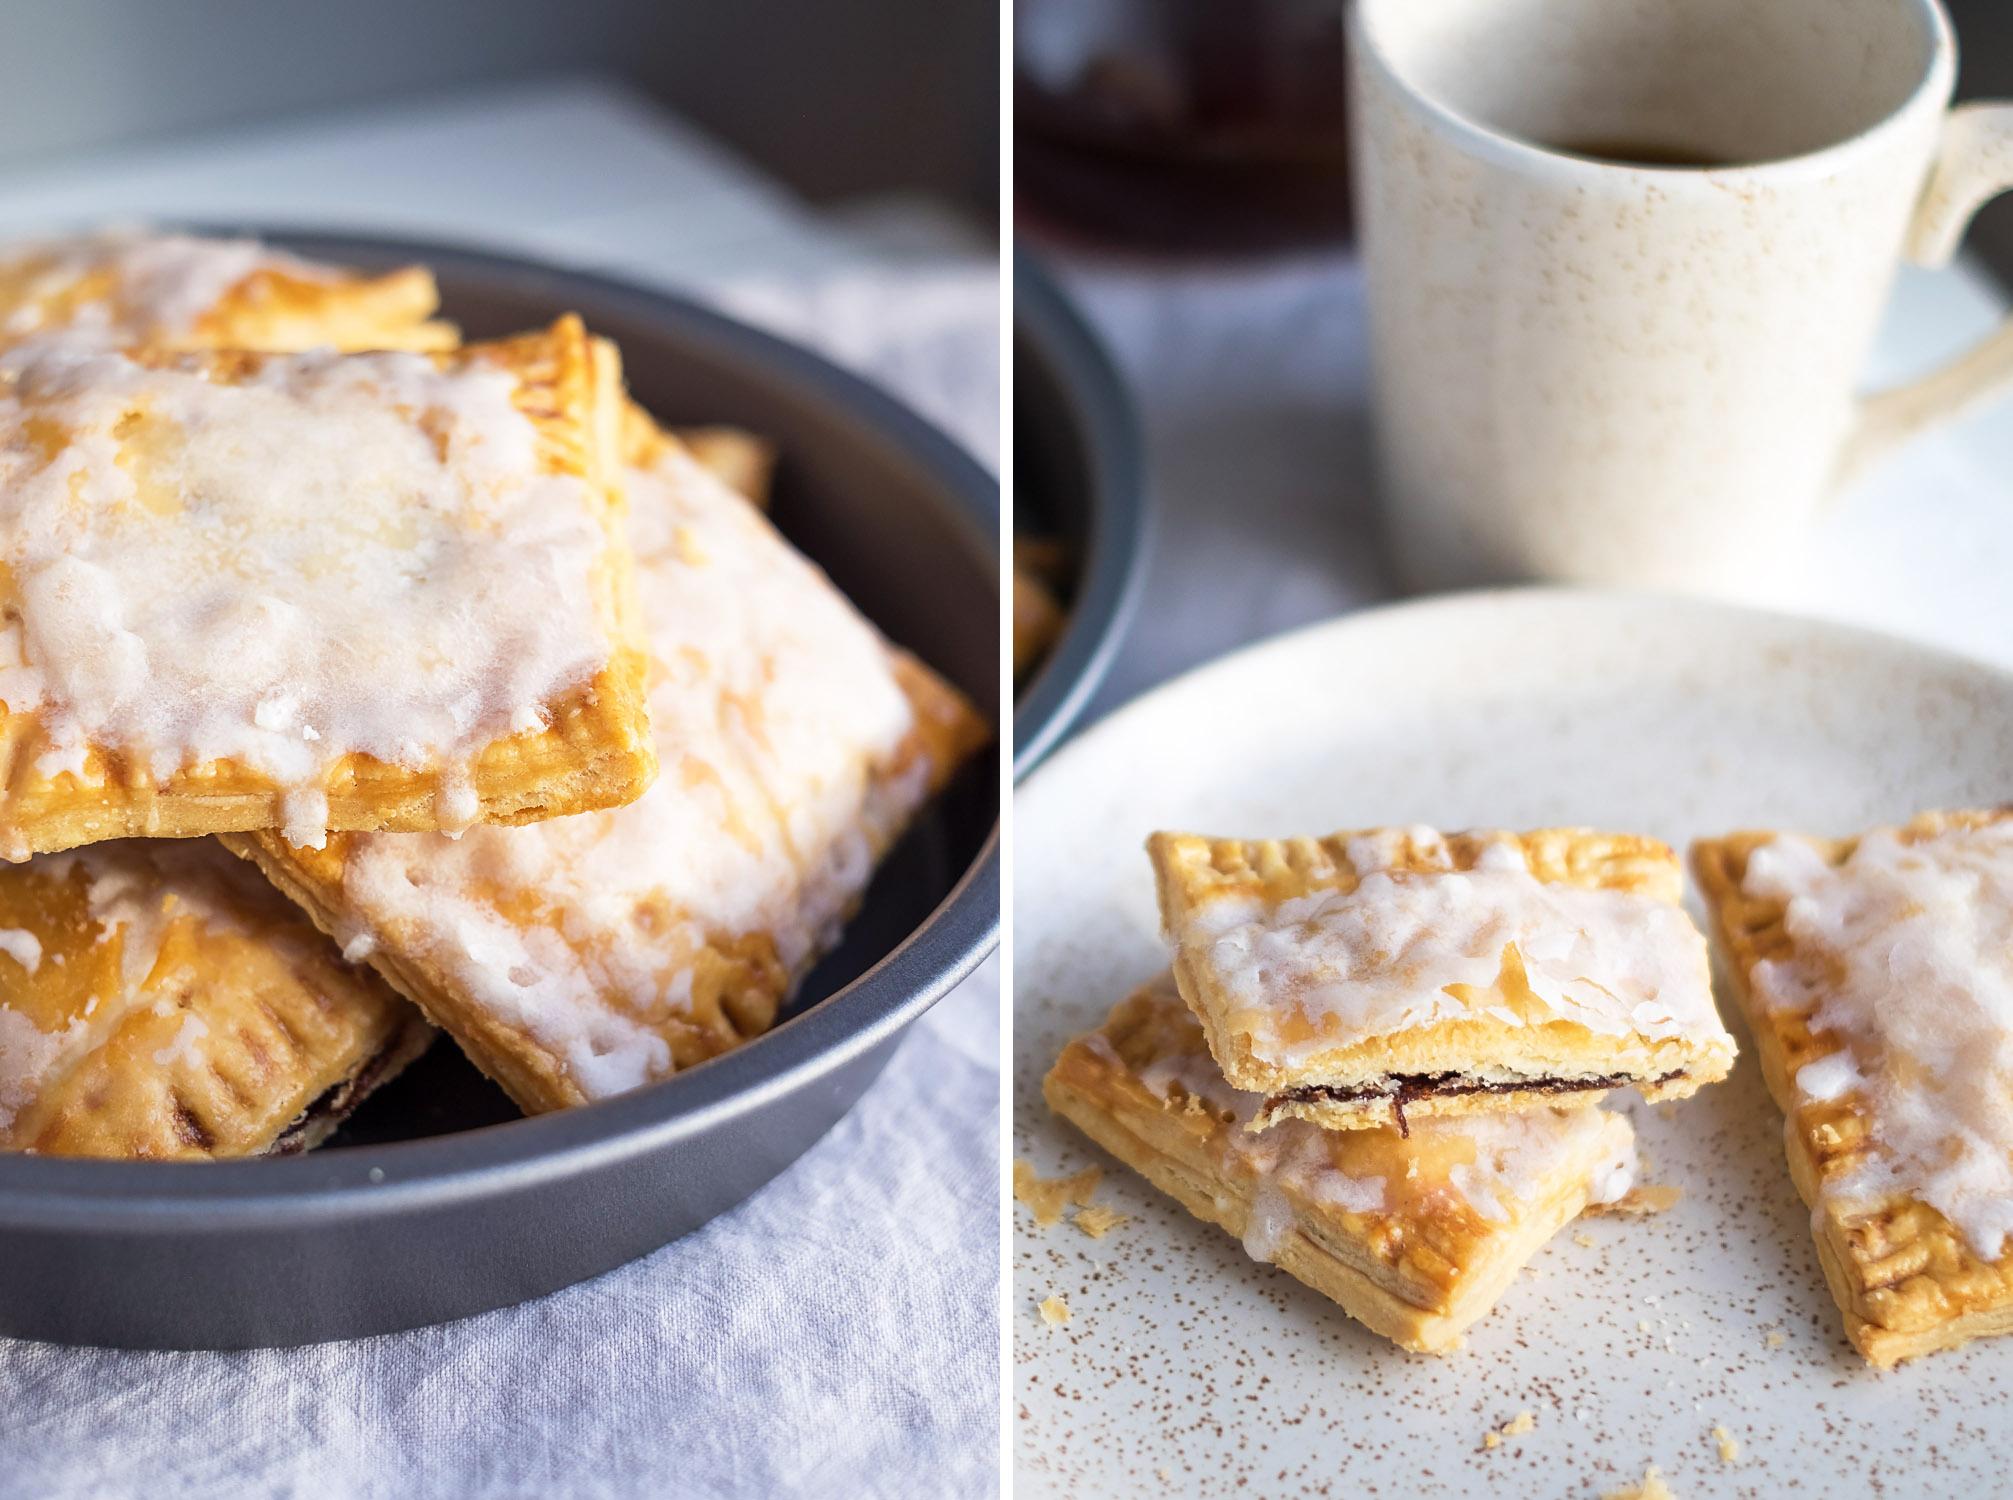 Homemade Brown Sugar Cinnamon Pop Tarts